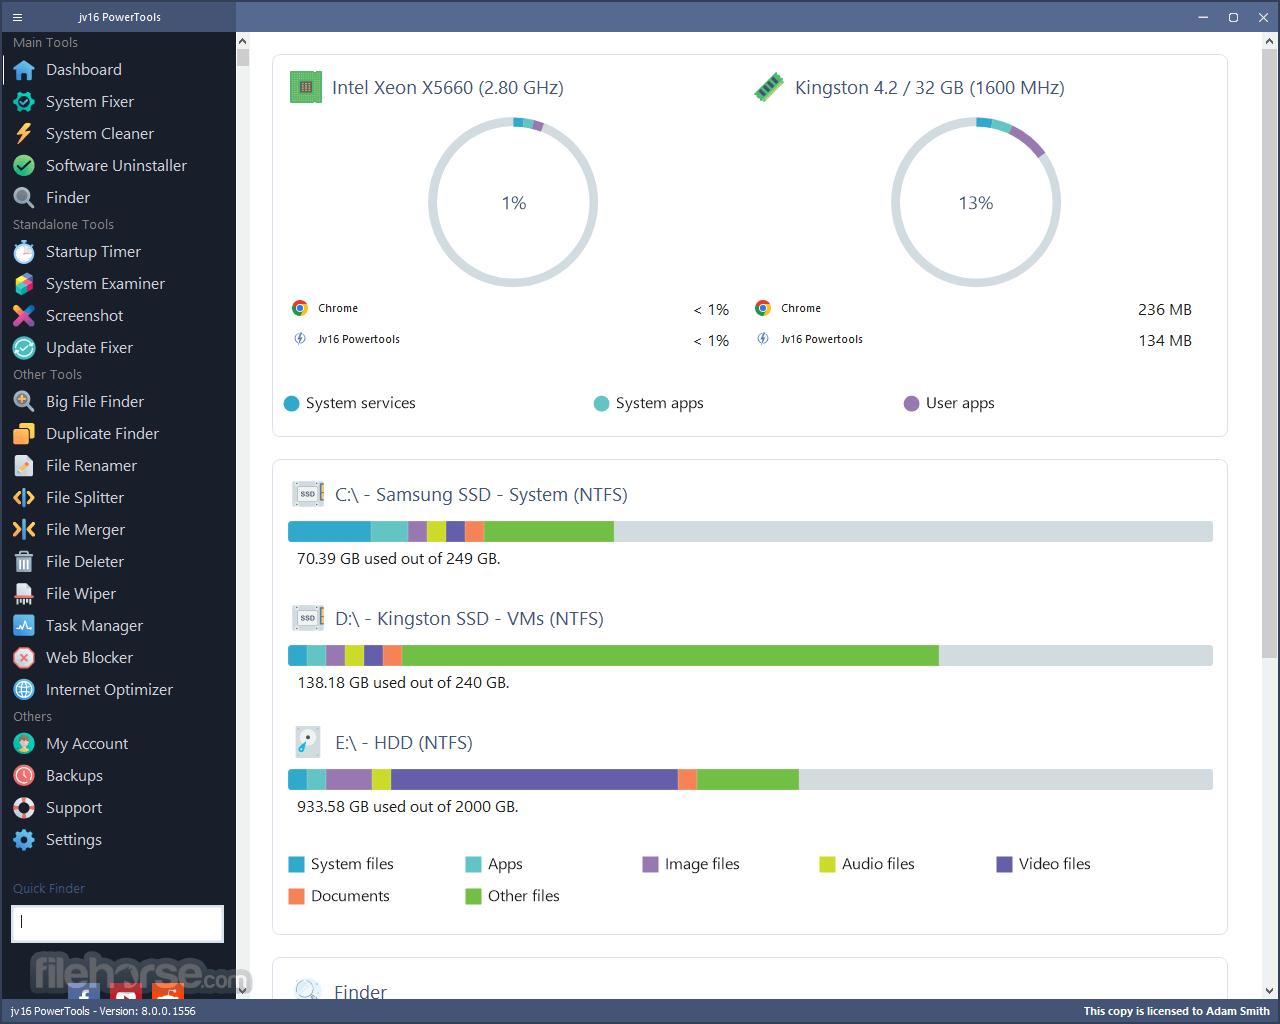 jv16 PowerTools 5.0.0.668 Screenshot 1